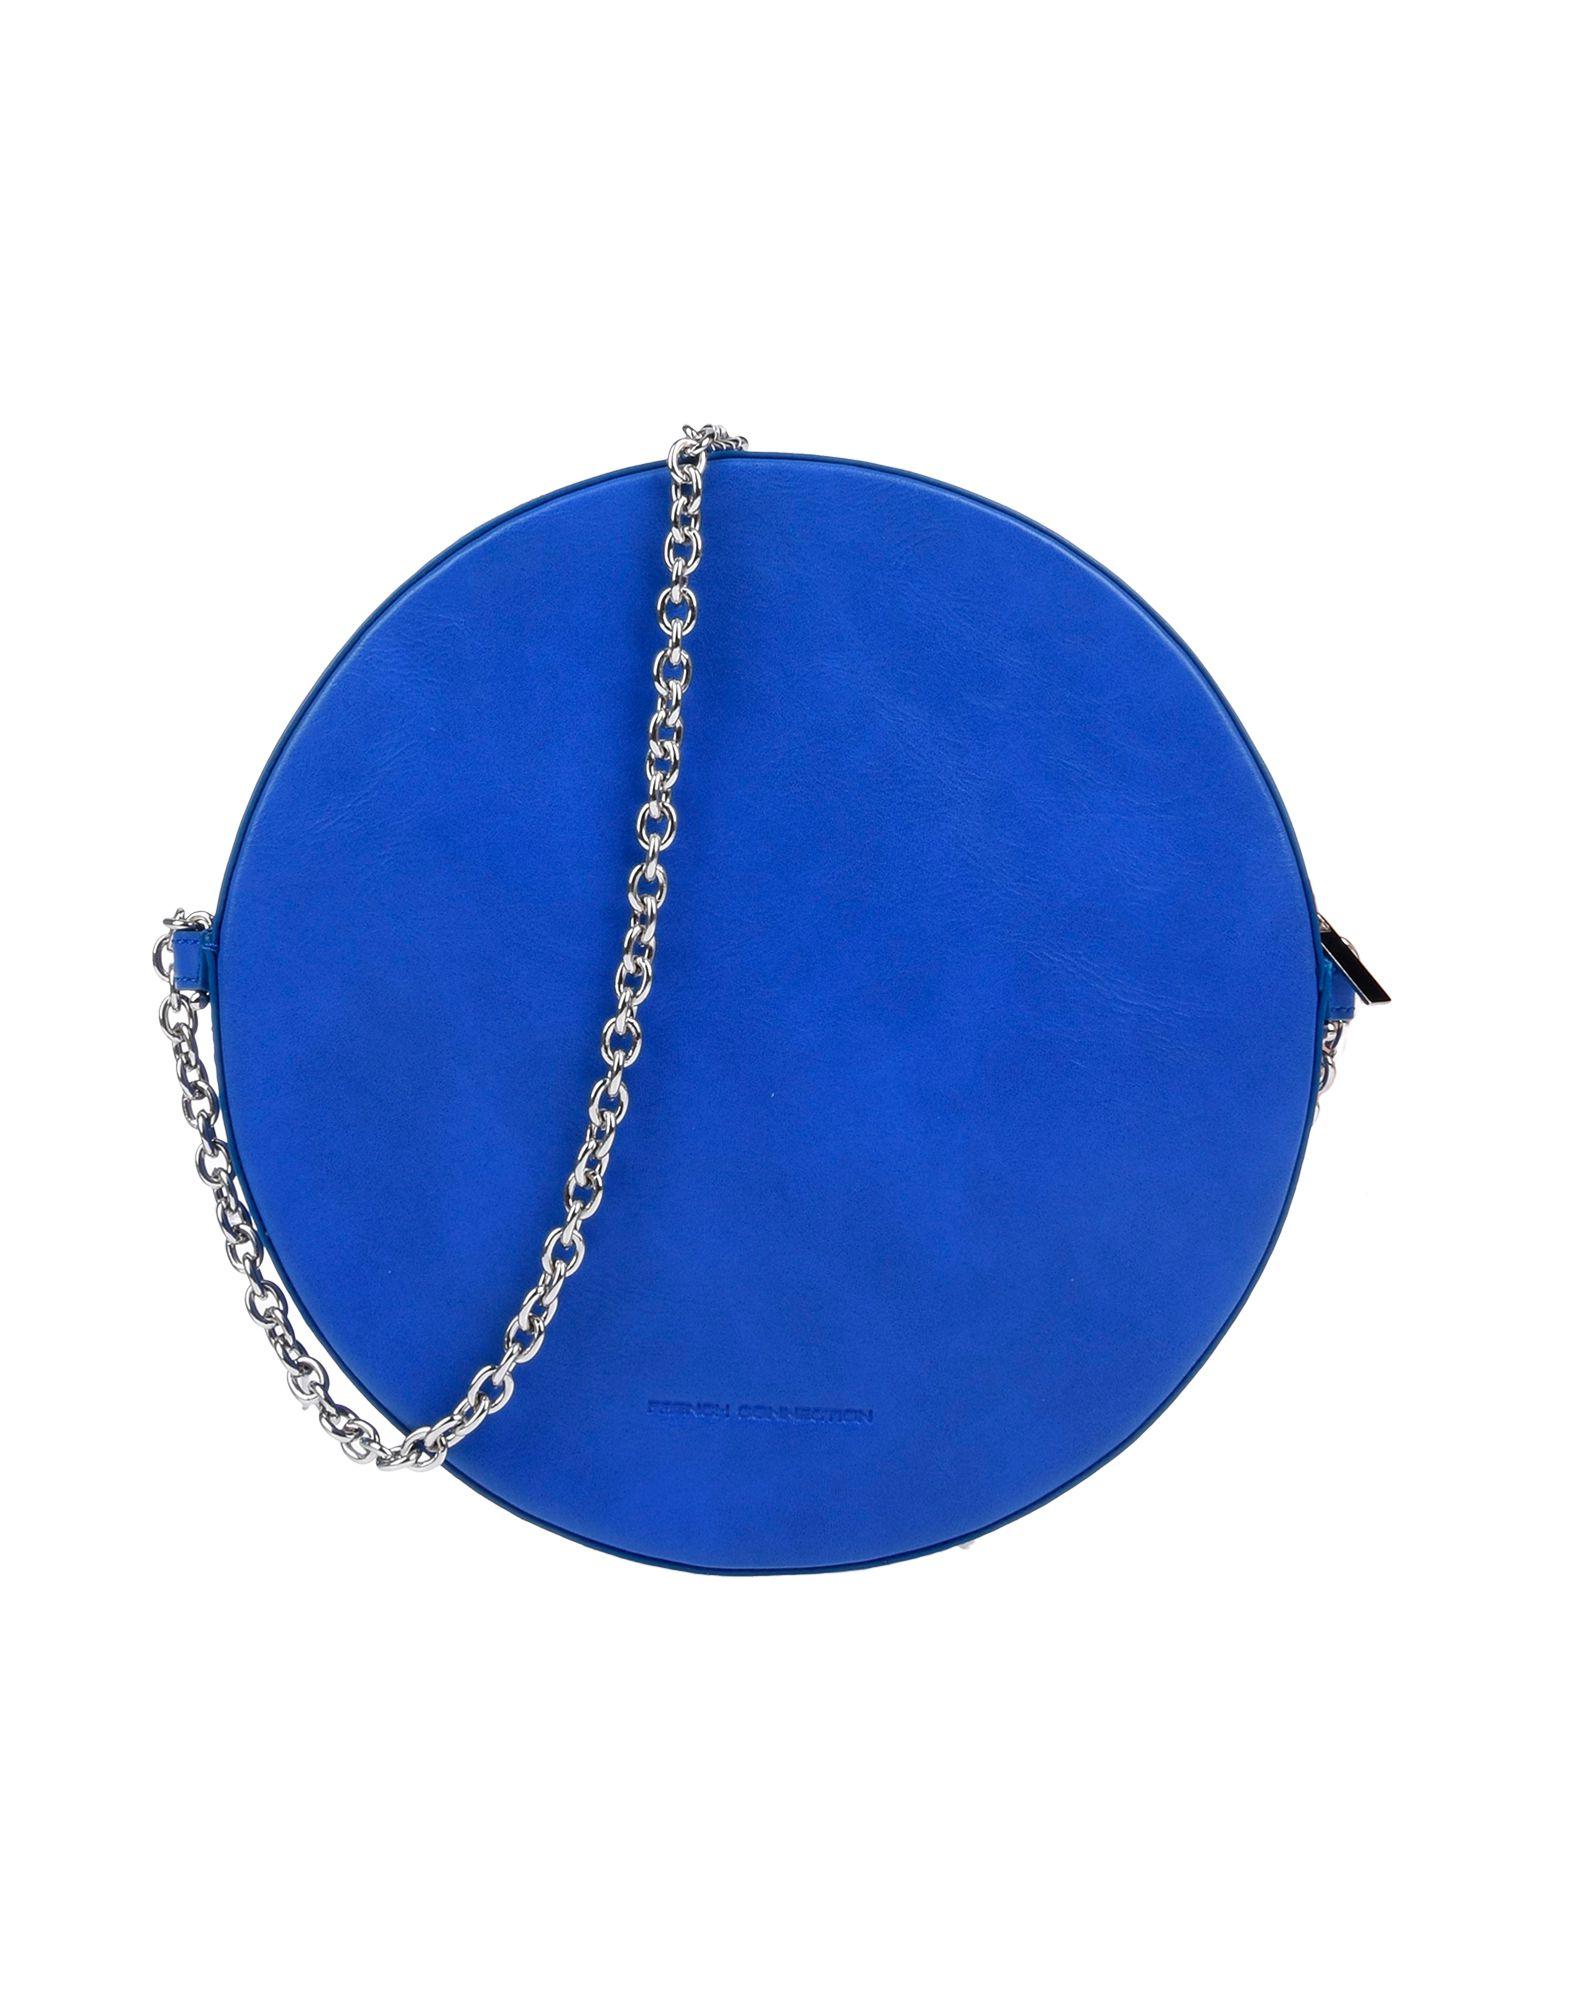 FRENCH CONNECTION Сумка через плечо сумка через плечо anais gvani croco ag 1471 350161